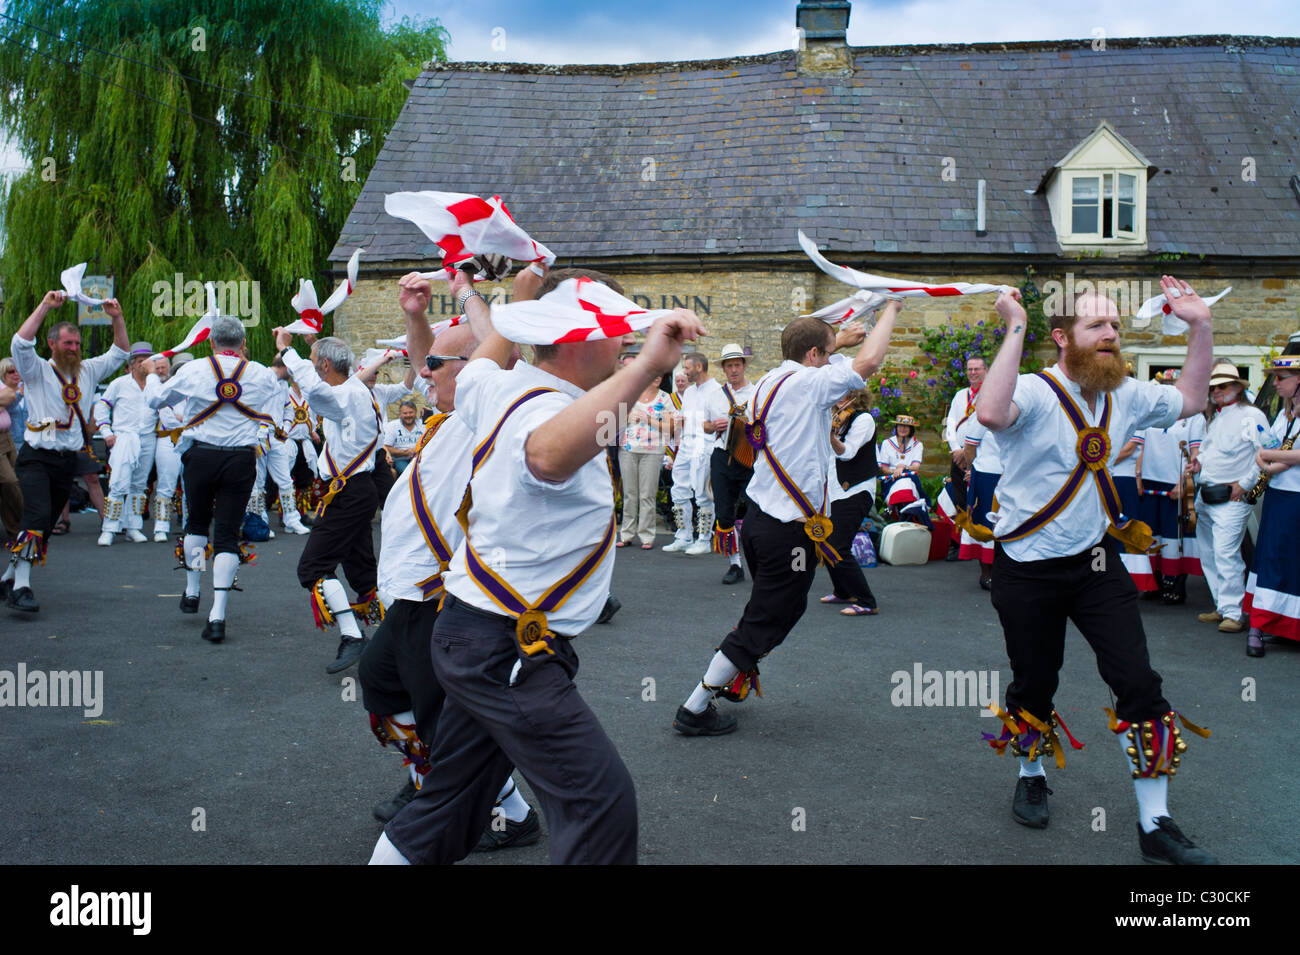 Morris dancers, Brighton Morris Men, perform a dancing display at The Kings Head Pub in Bledington, Oxfordshire, - Stock Image